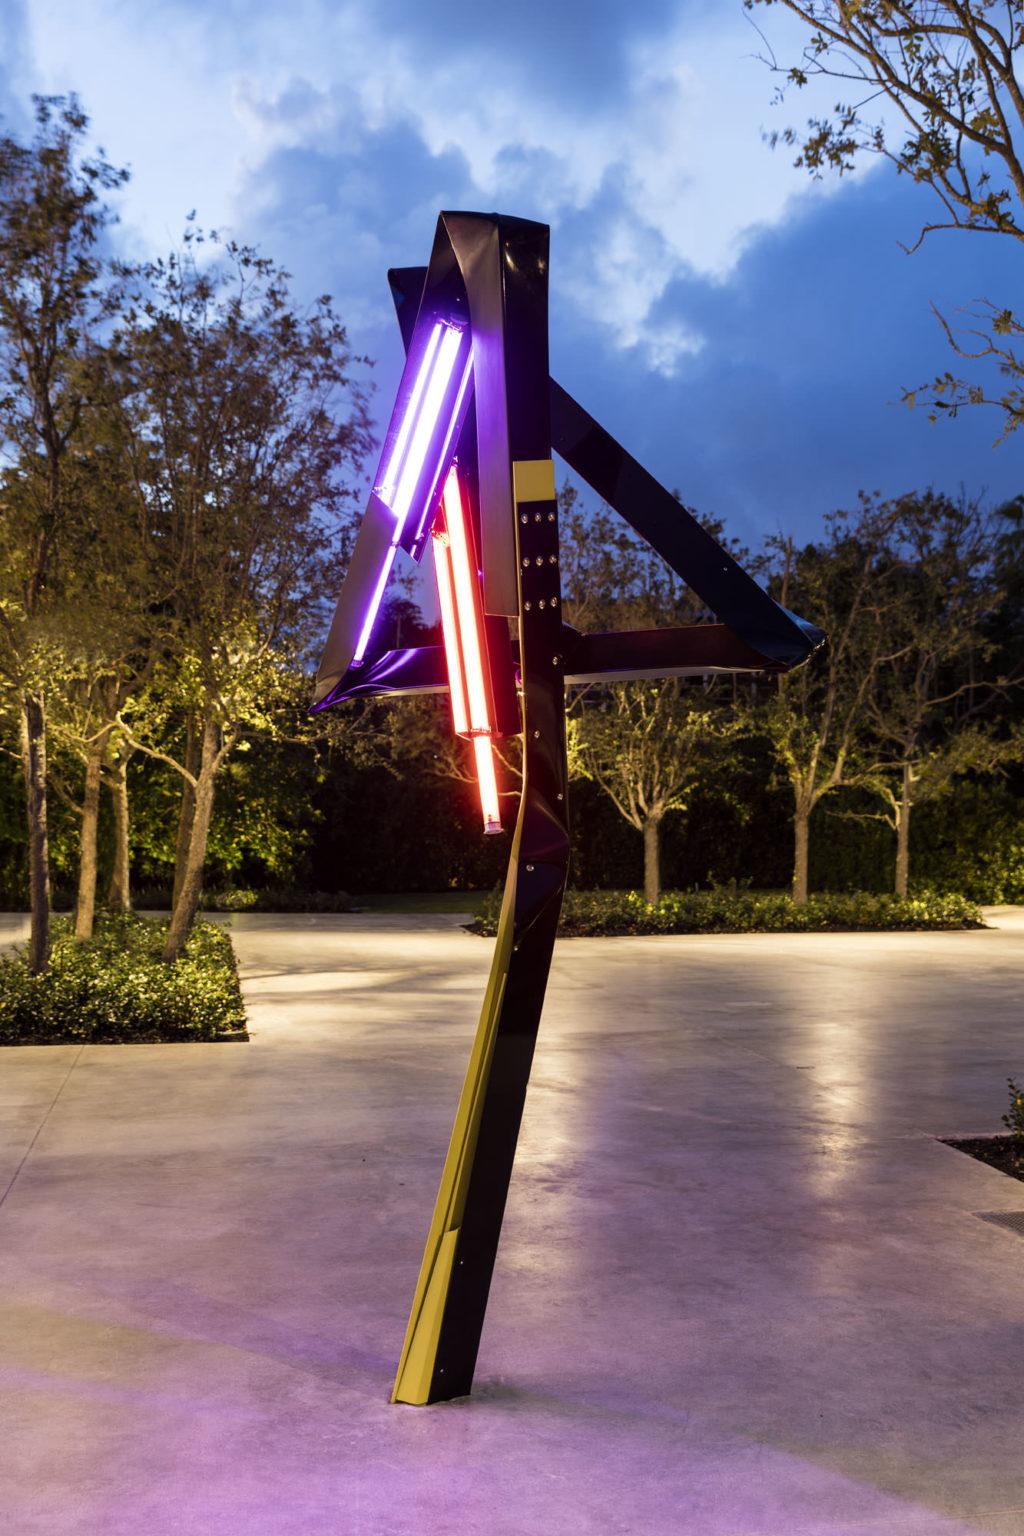 Installation view Mark Handforth, Dr. Pepper, 2017 at ICA Miami